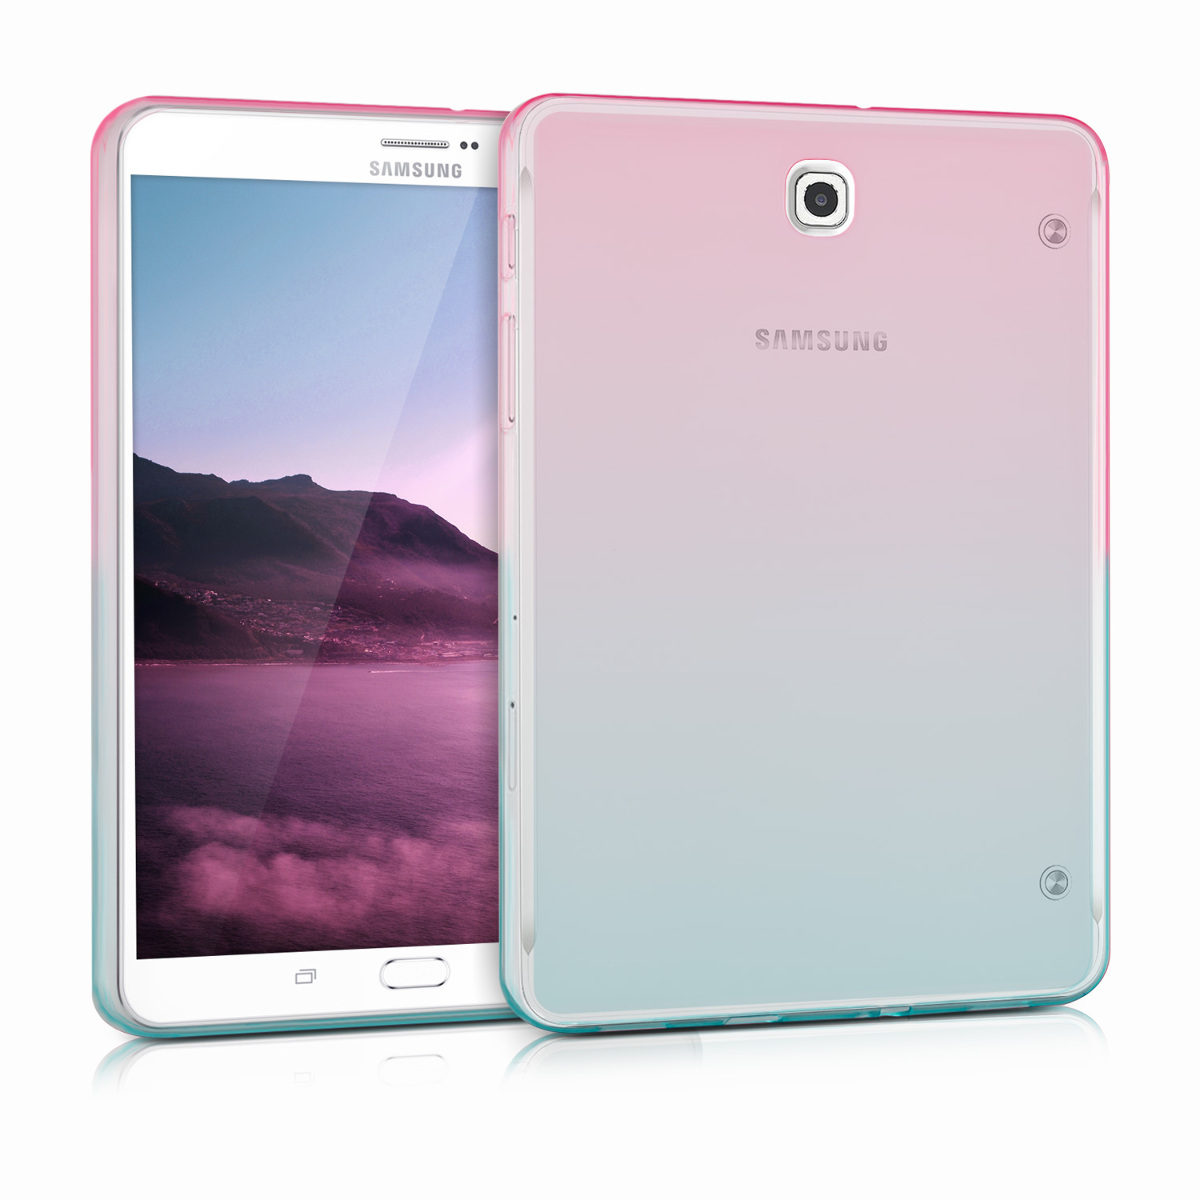 KW Θήκη Σιλικόνης Samsung Galaxy Tab S2 8.0 - Dark Pink / Blue / Transparent (36289.01)